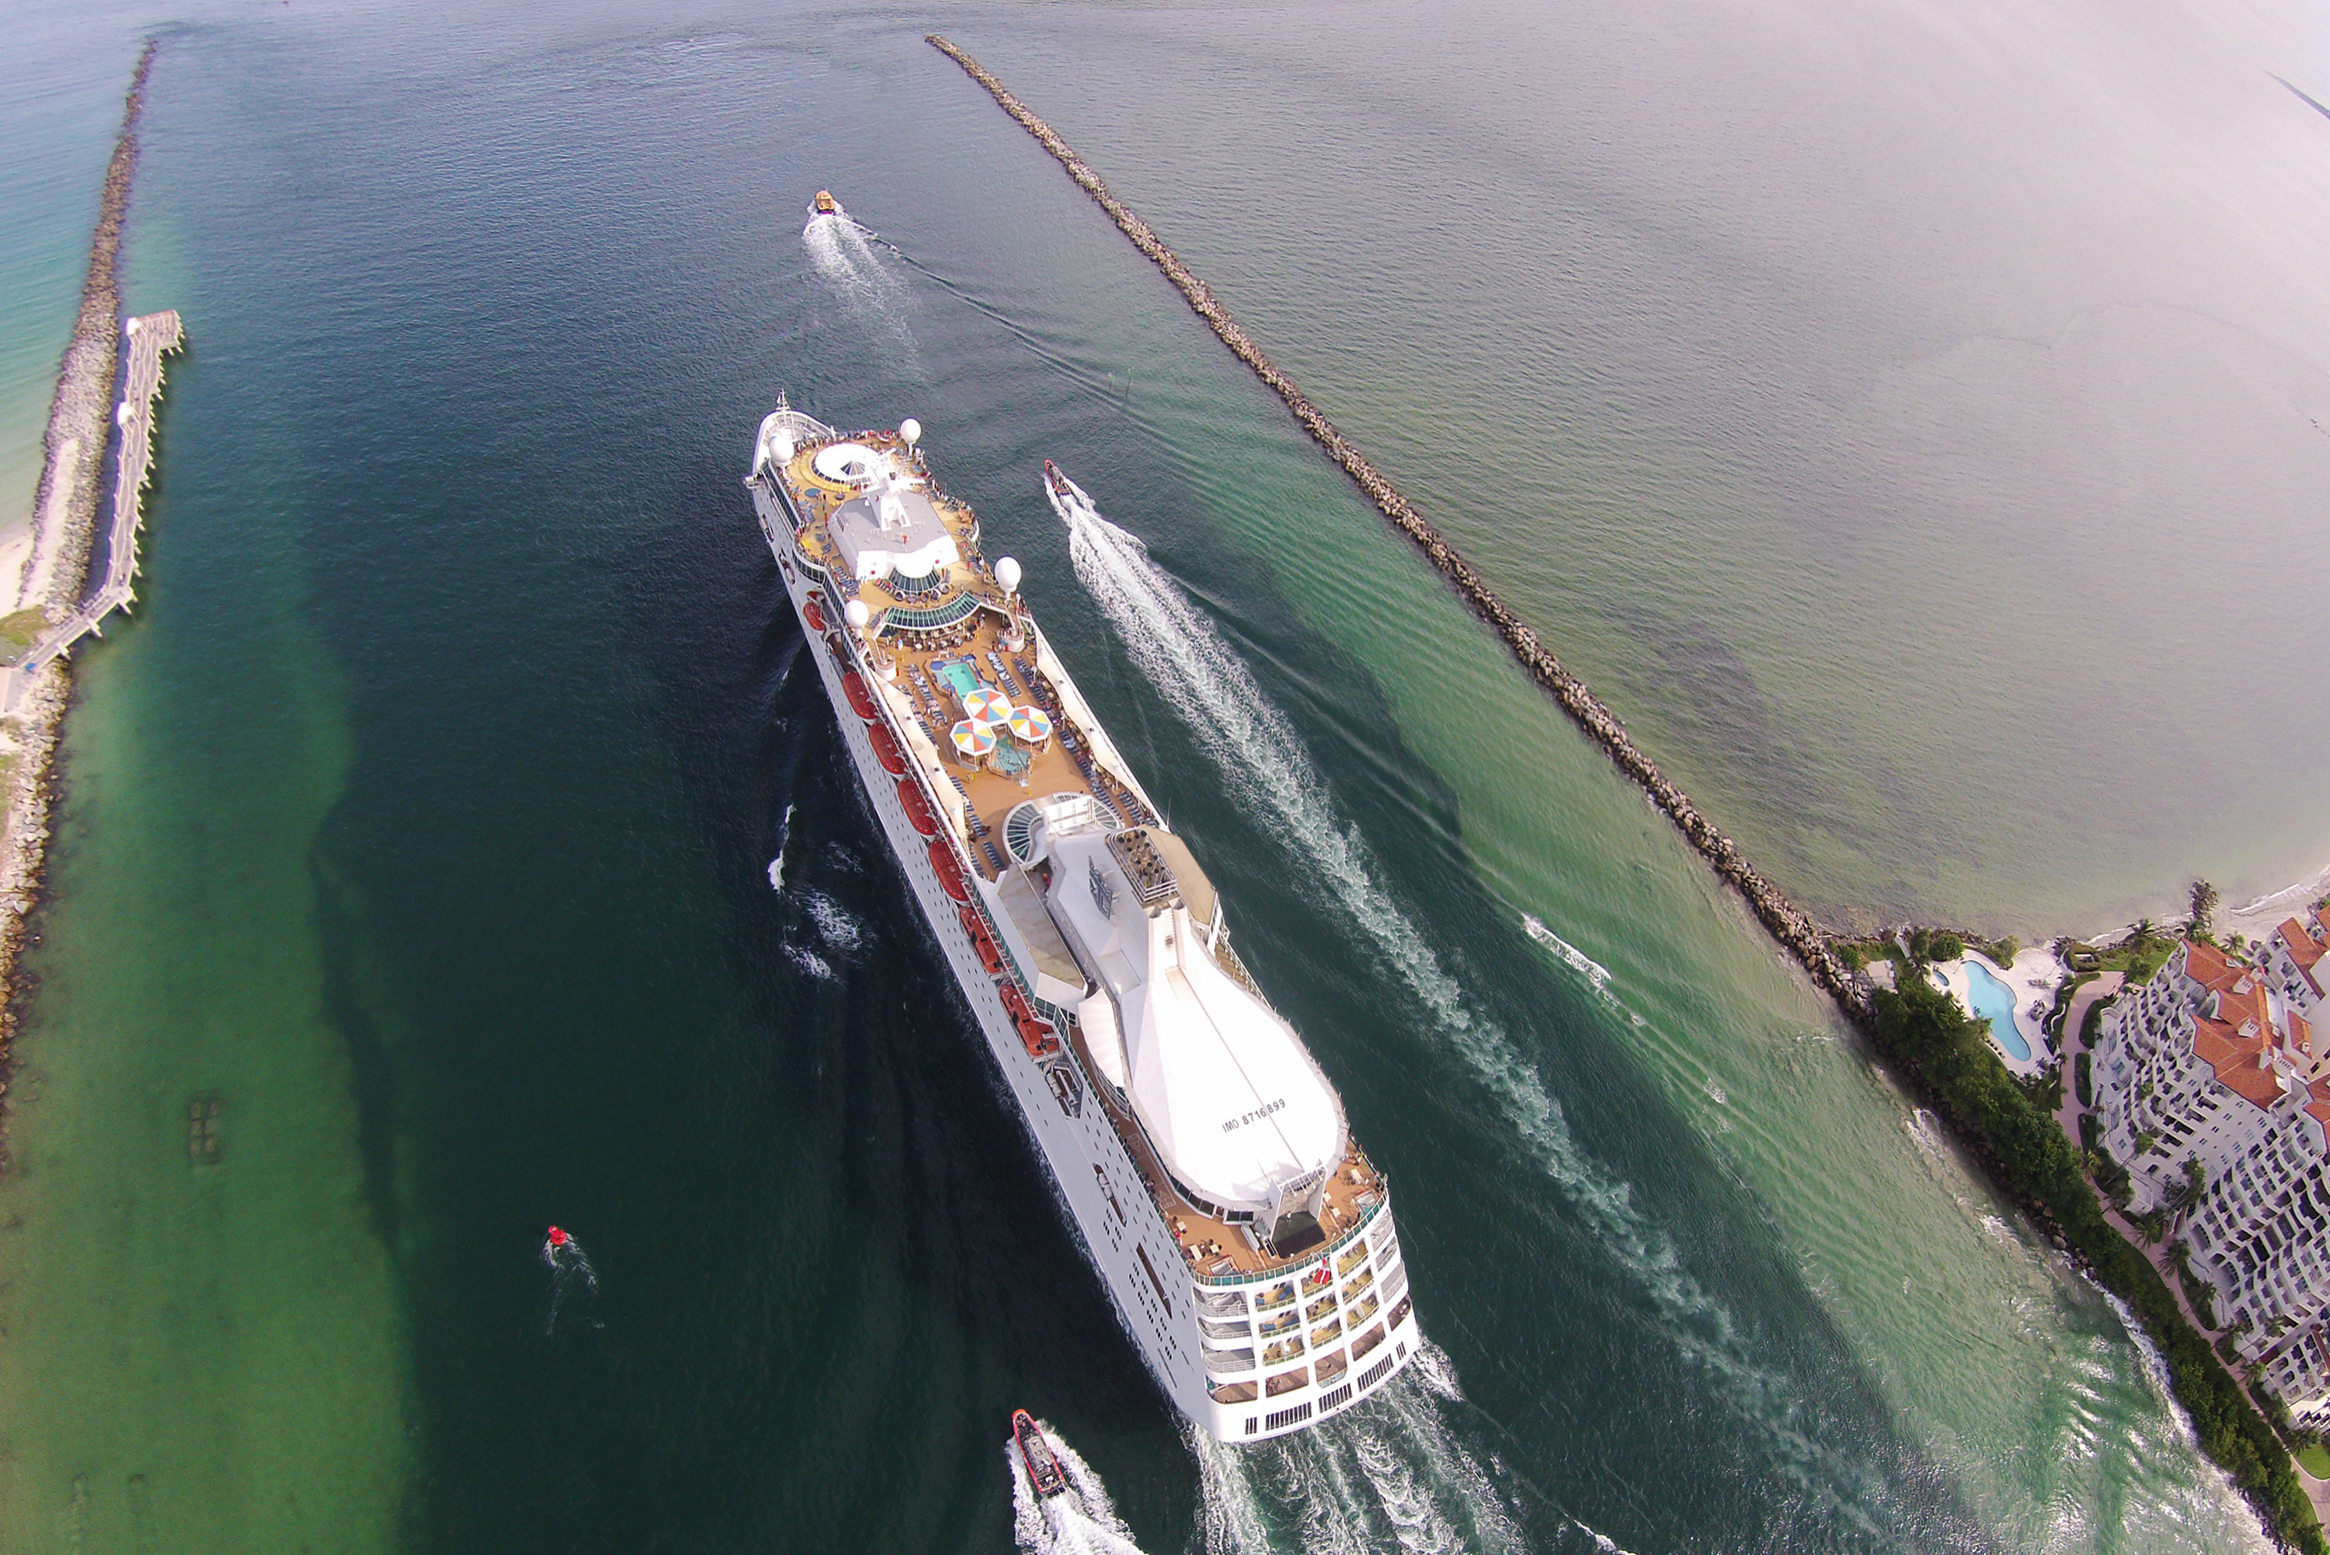 CruiseBoat01.jpg